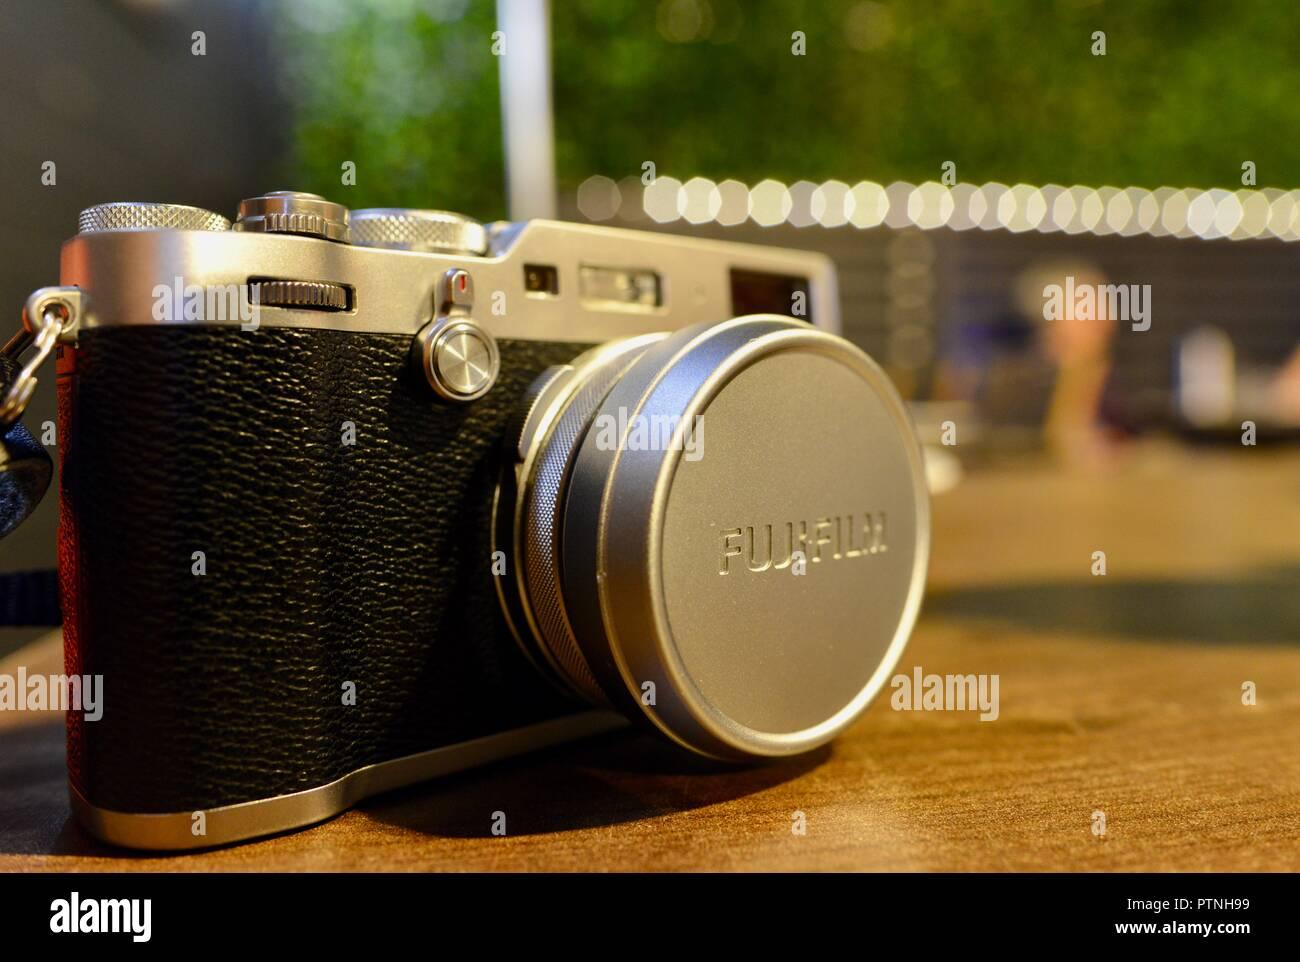 Fujifilm x100f camera on a table at night - Stock Image